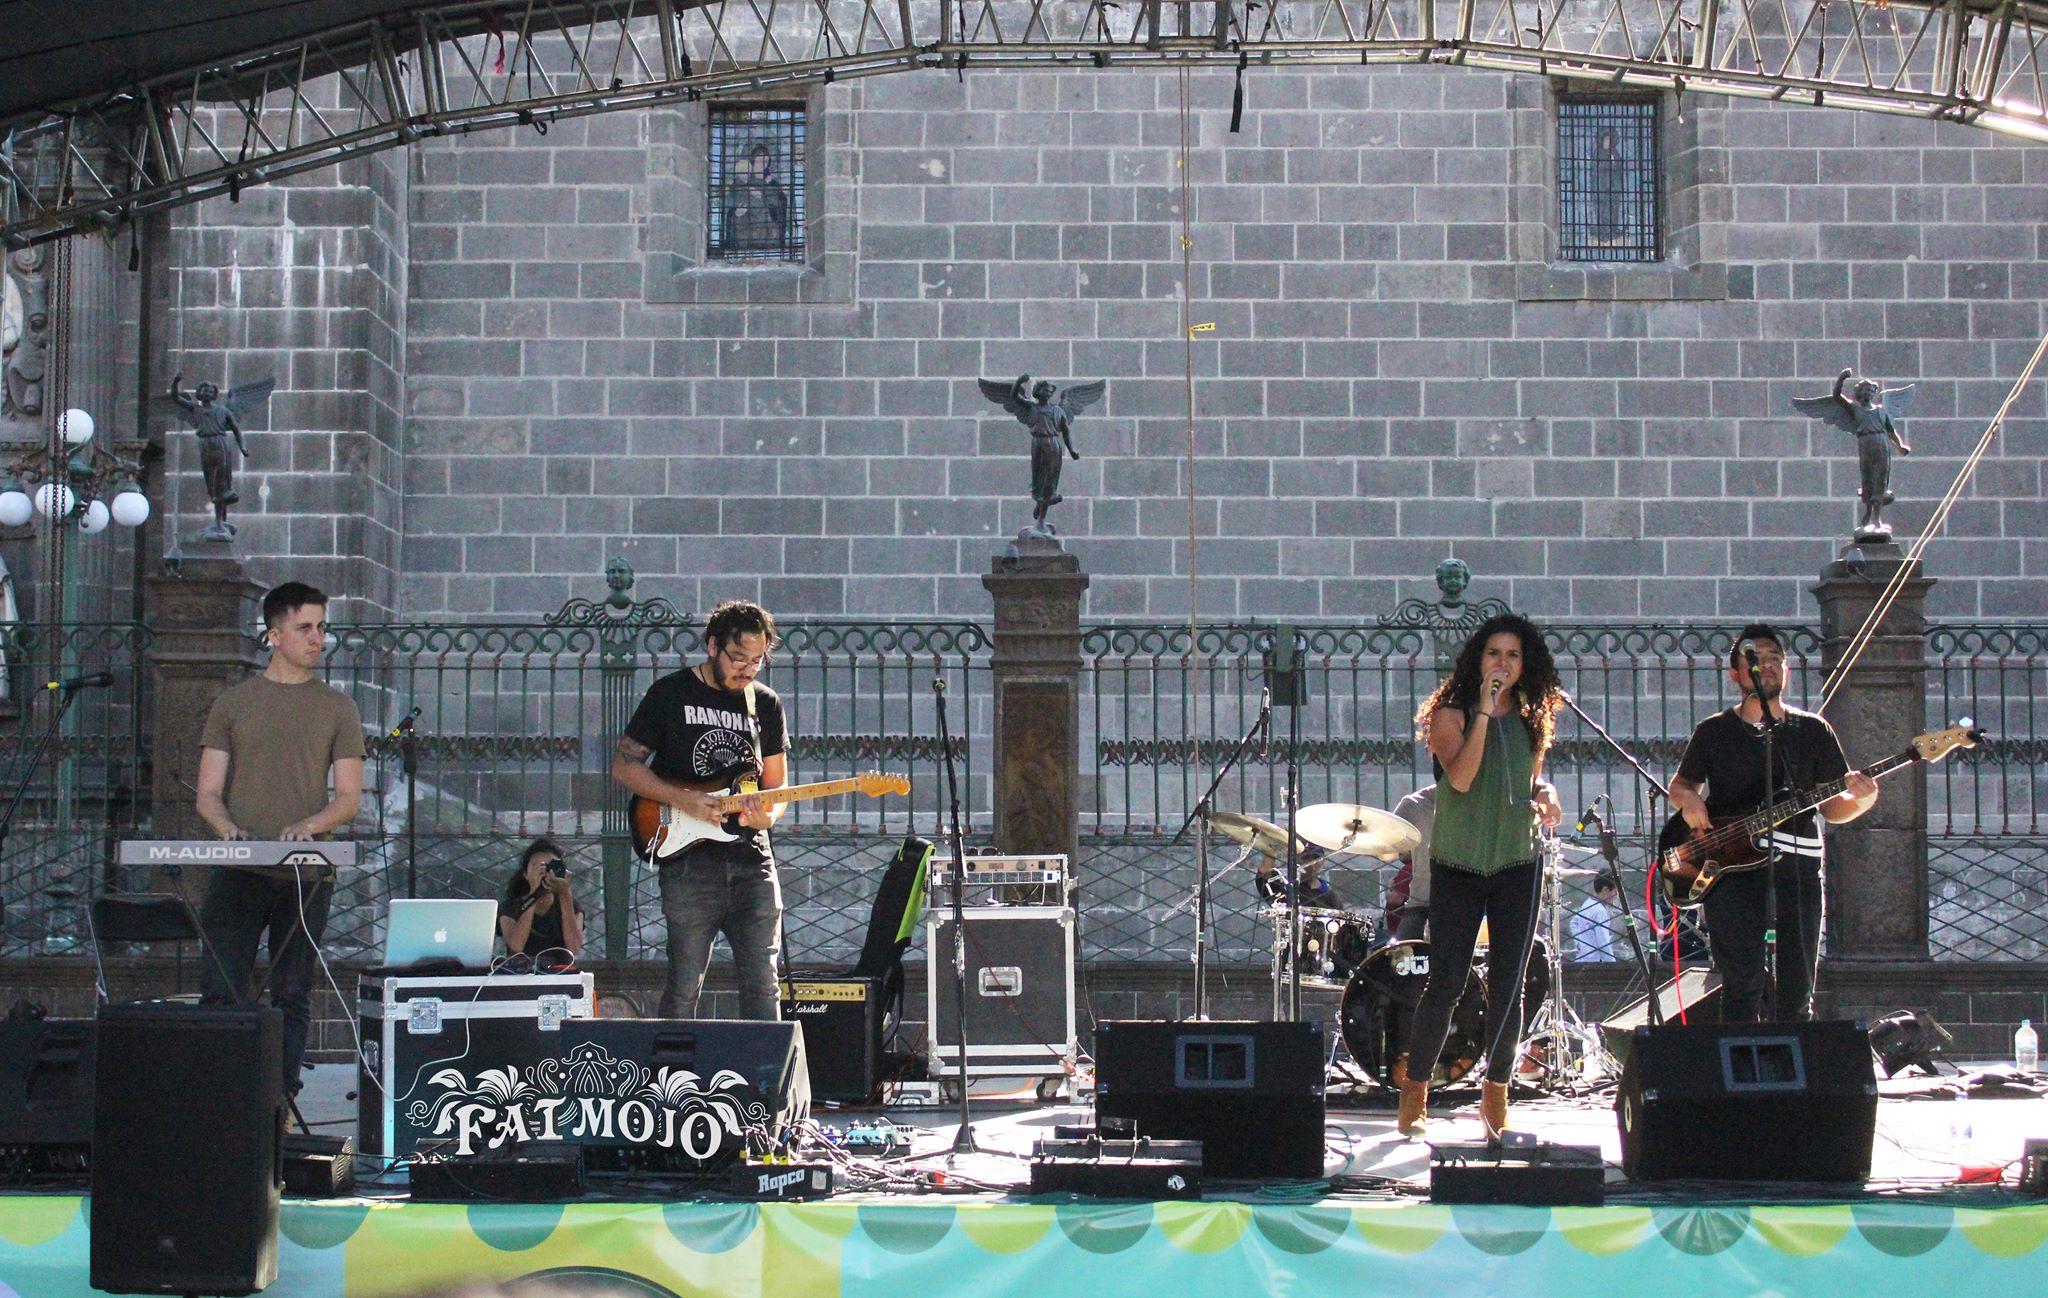 Fat Mojo - Festival Rodante